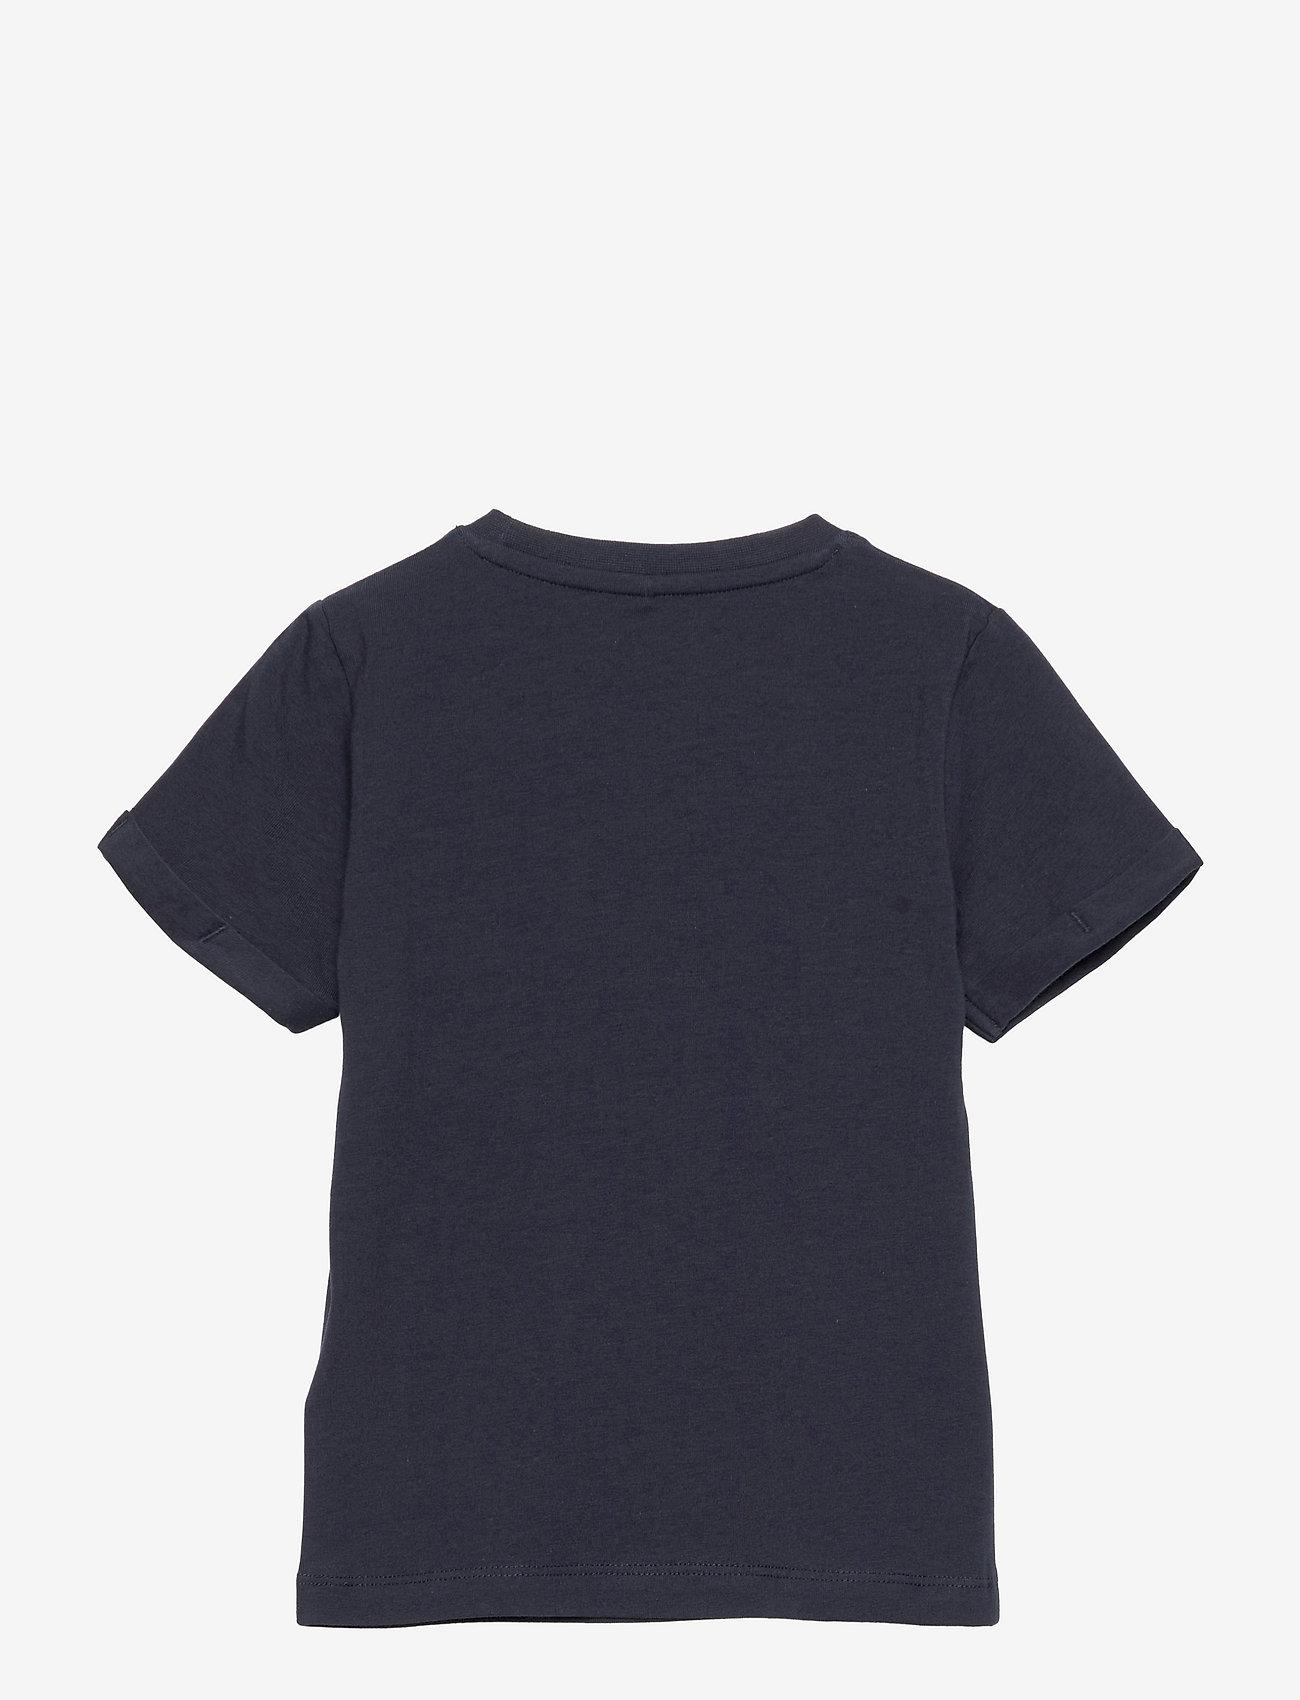 name it - NMMHOTWHEELS EVALD SS TOP LIC - t-shirts - dark sapphire - 1